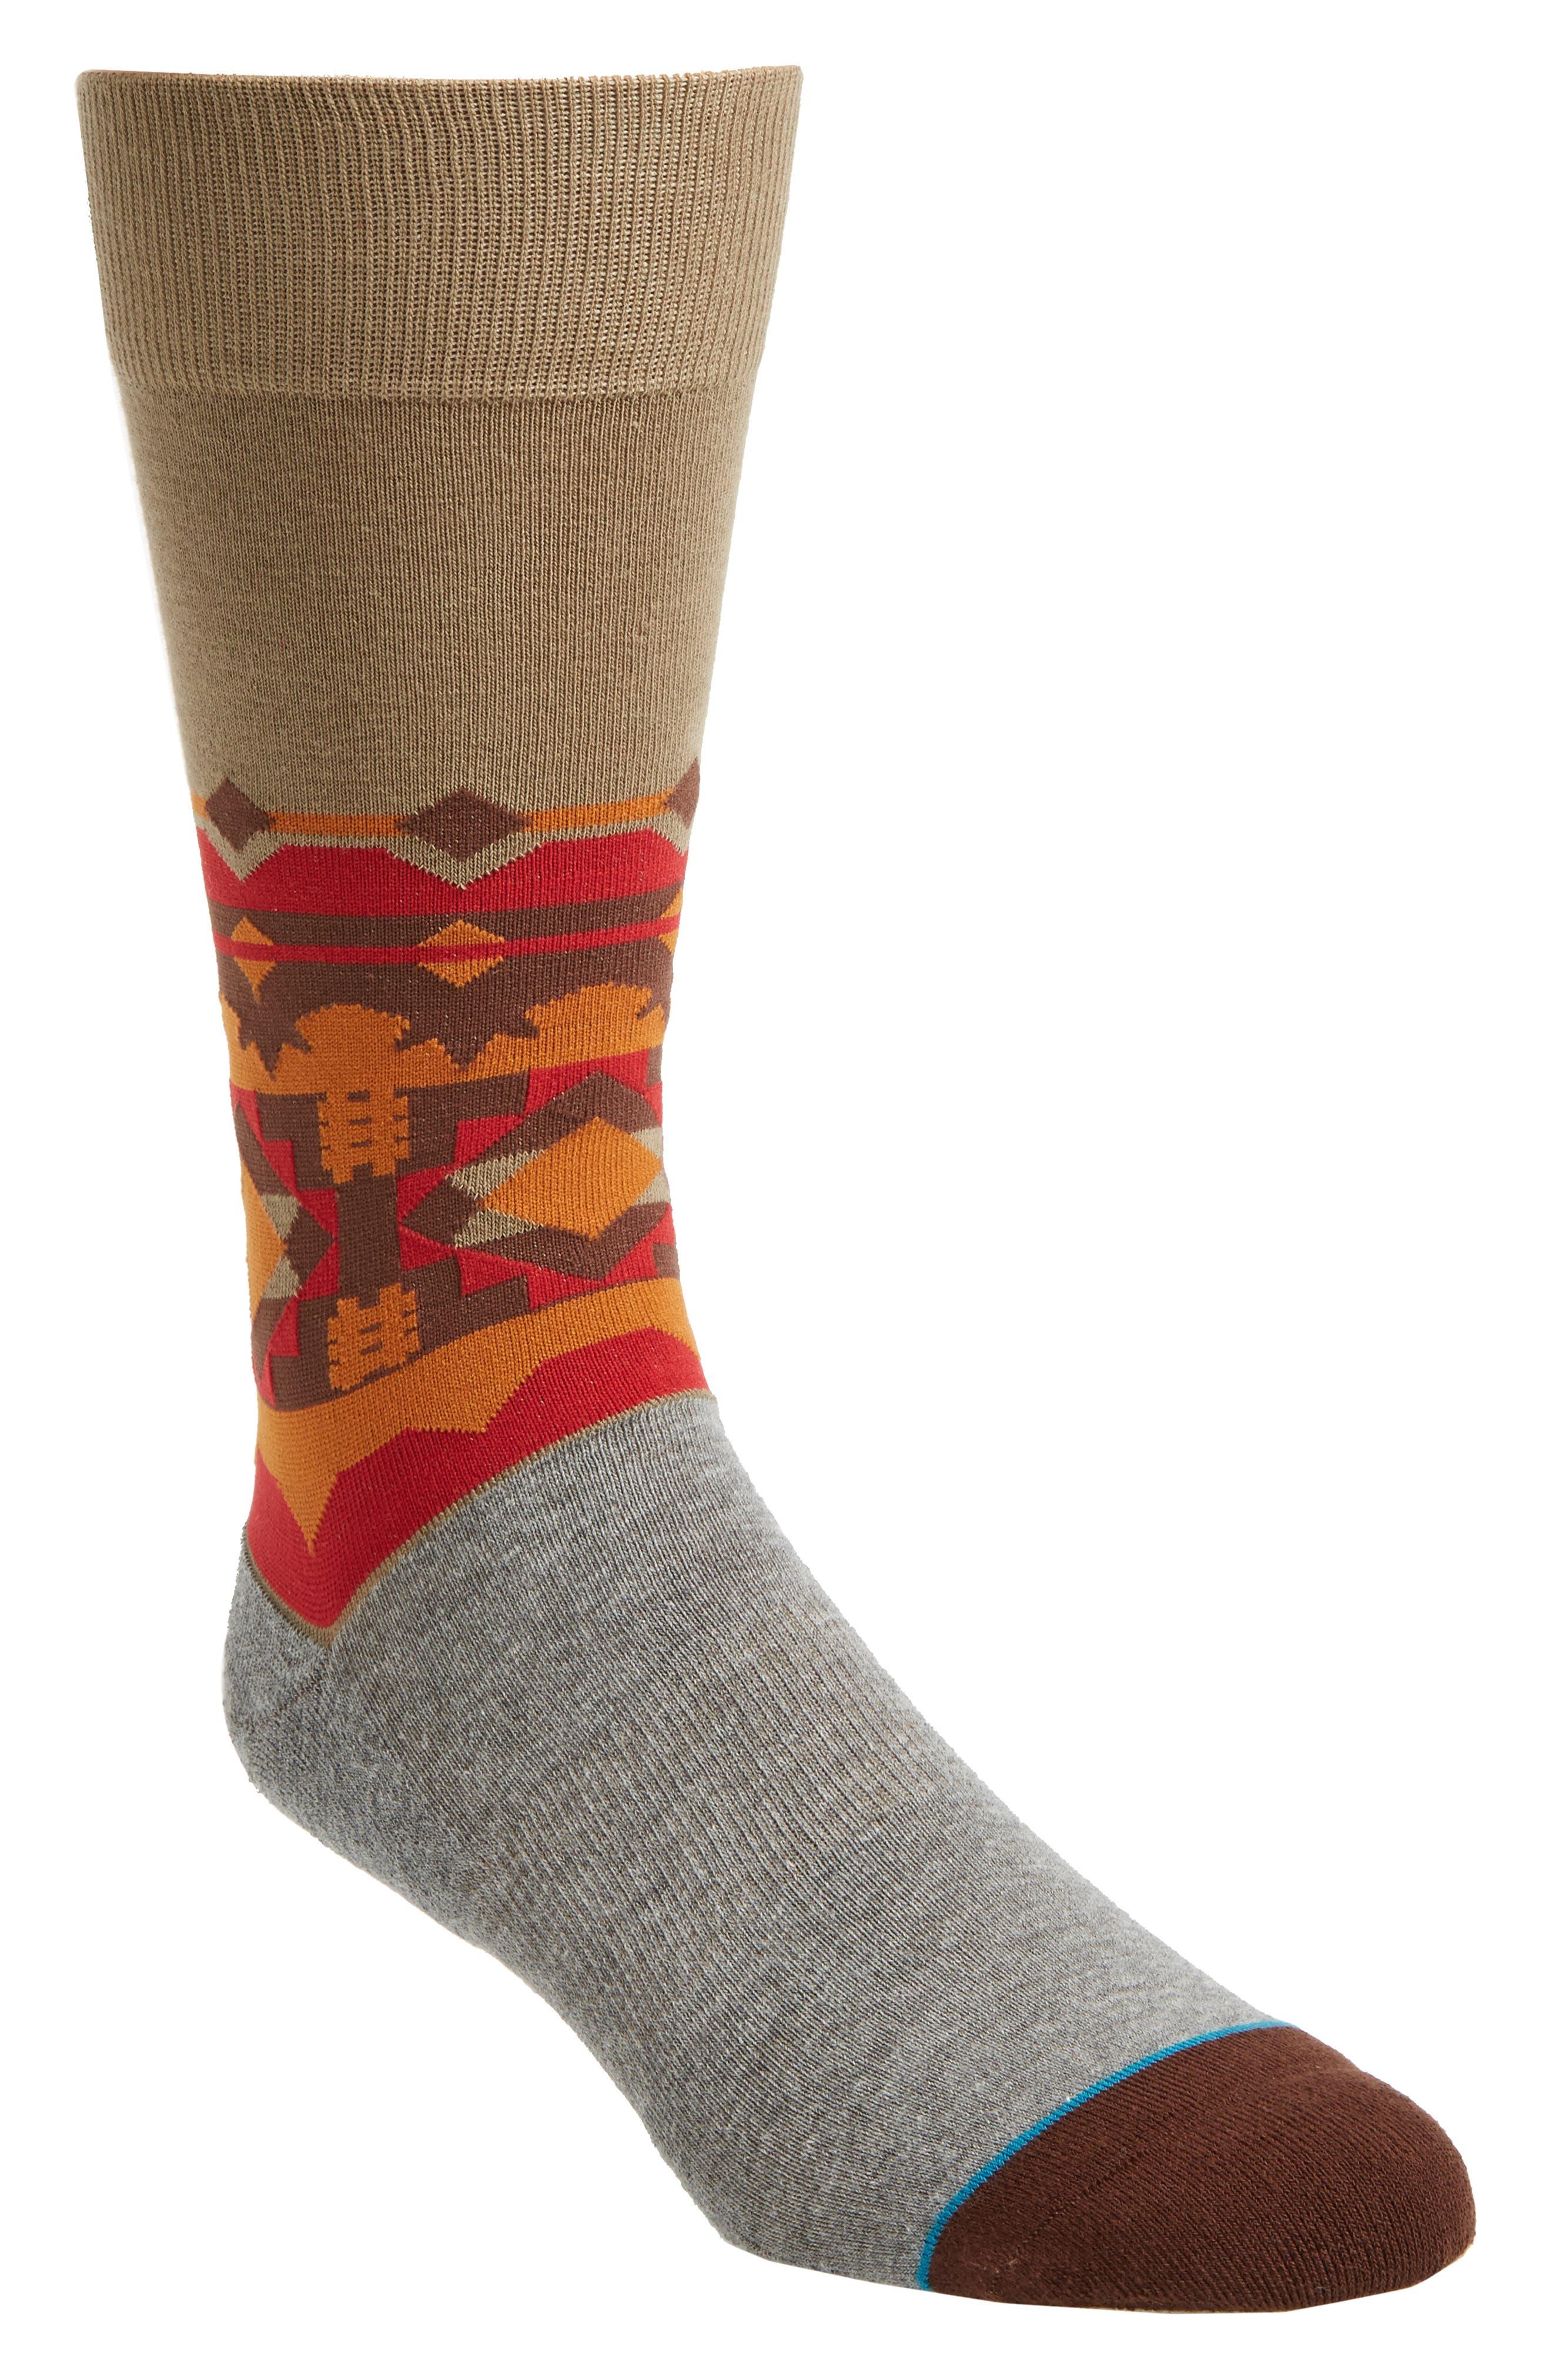 Alternate Image 1 Selected - Stance Sinaloa Socks